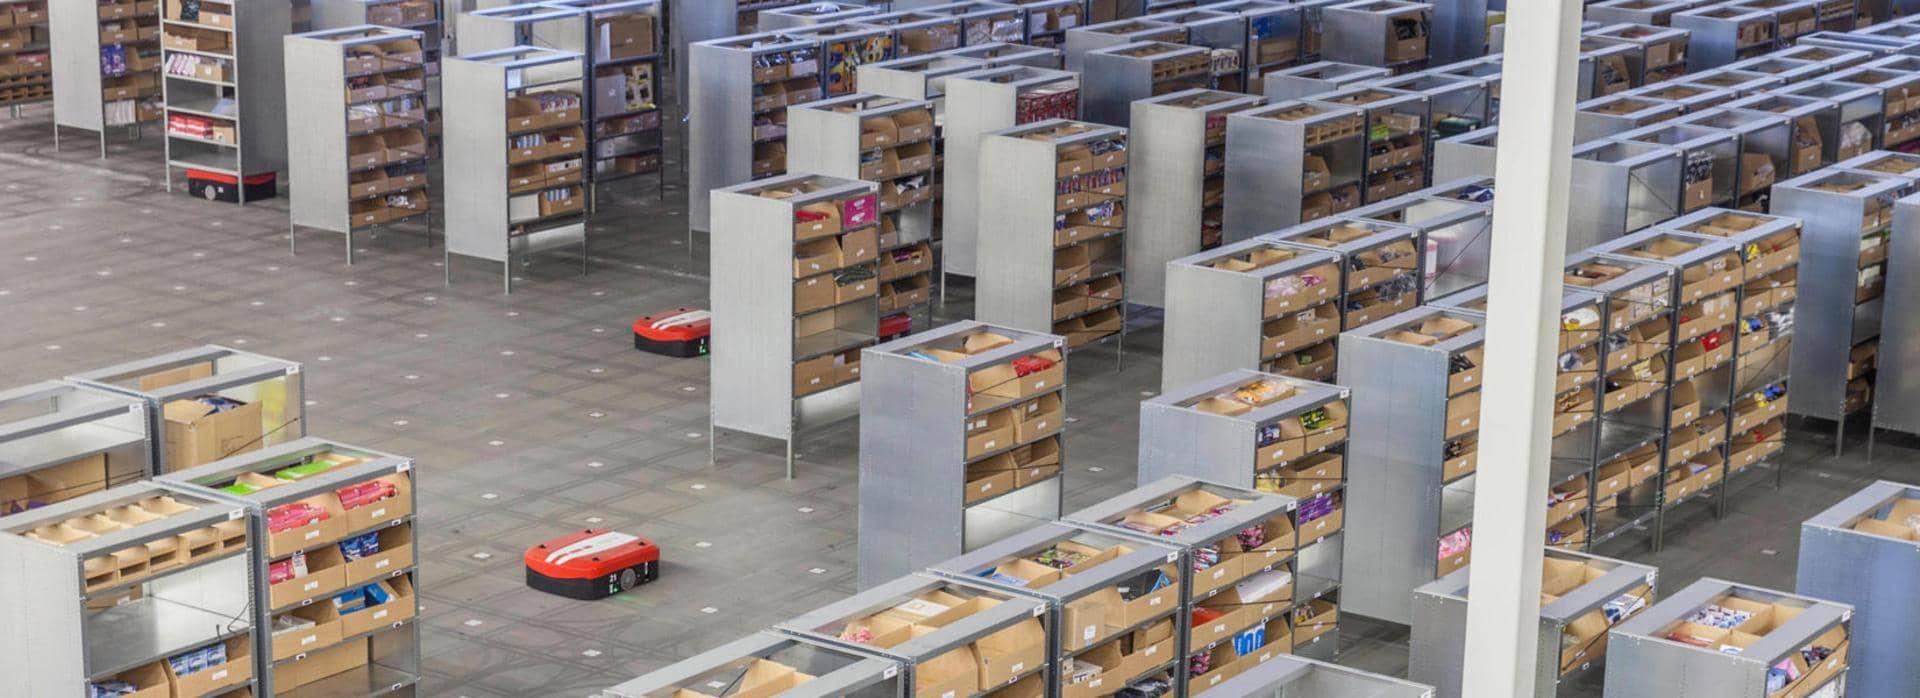 DB Schenker Finland | Global Logistics Solutions & Supply